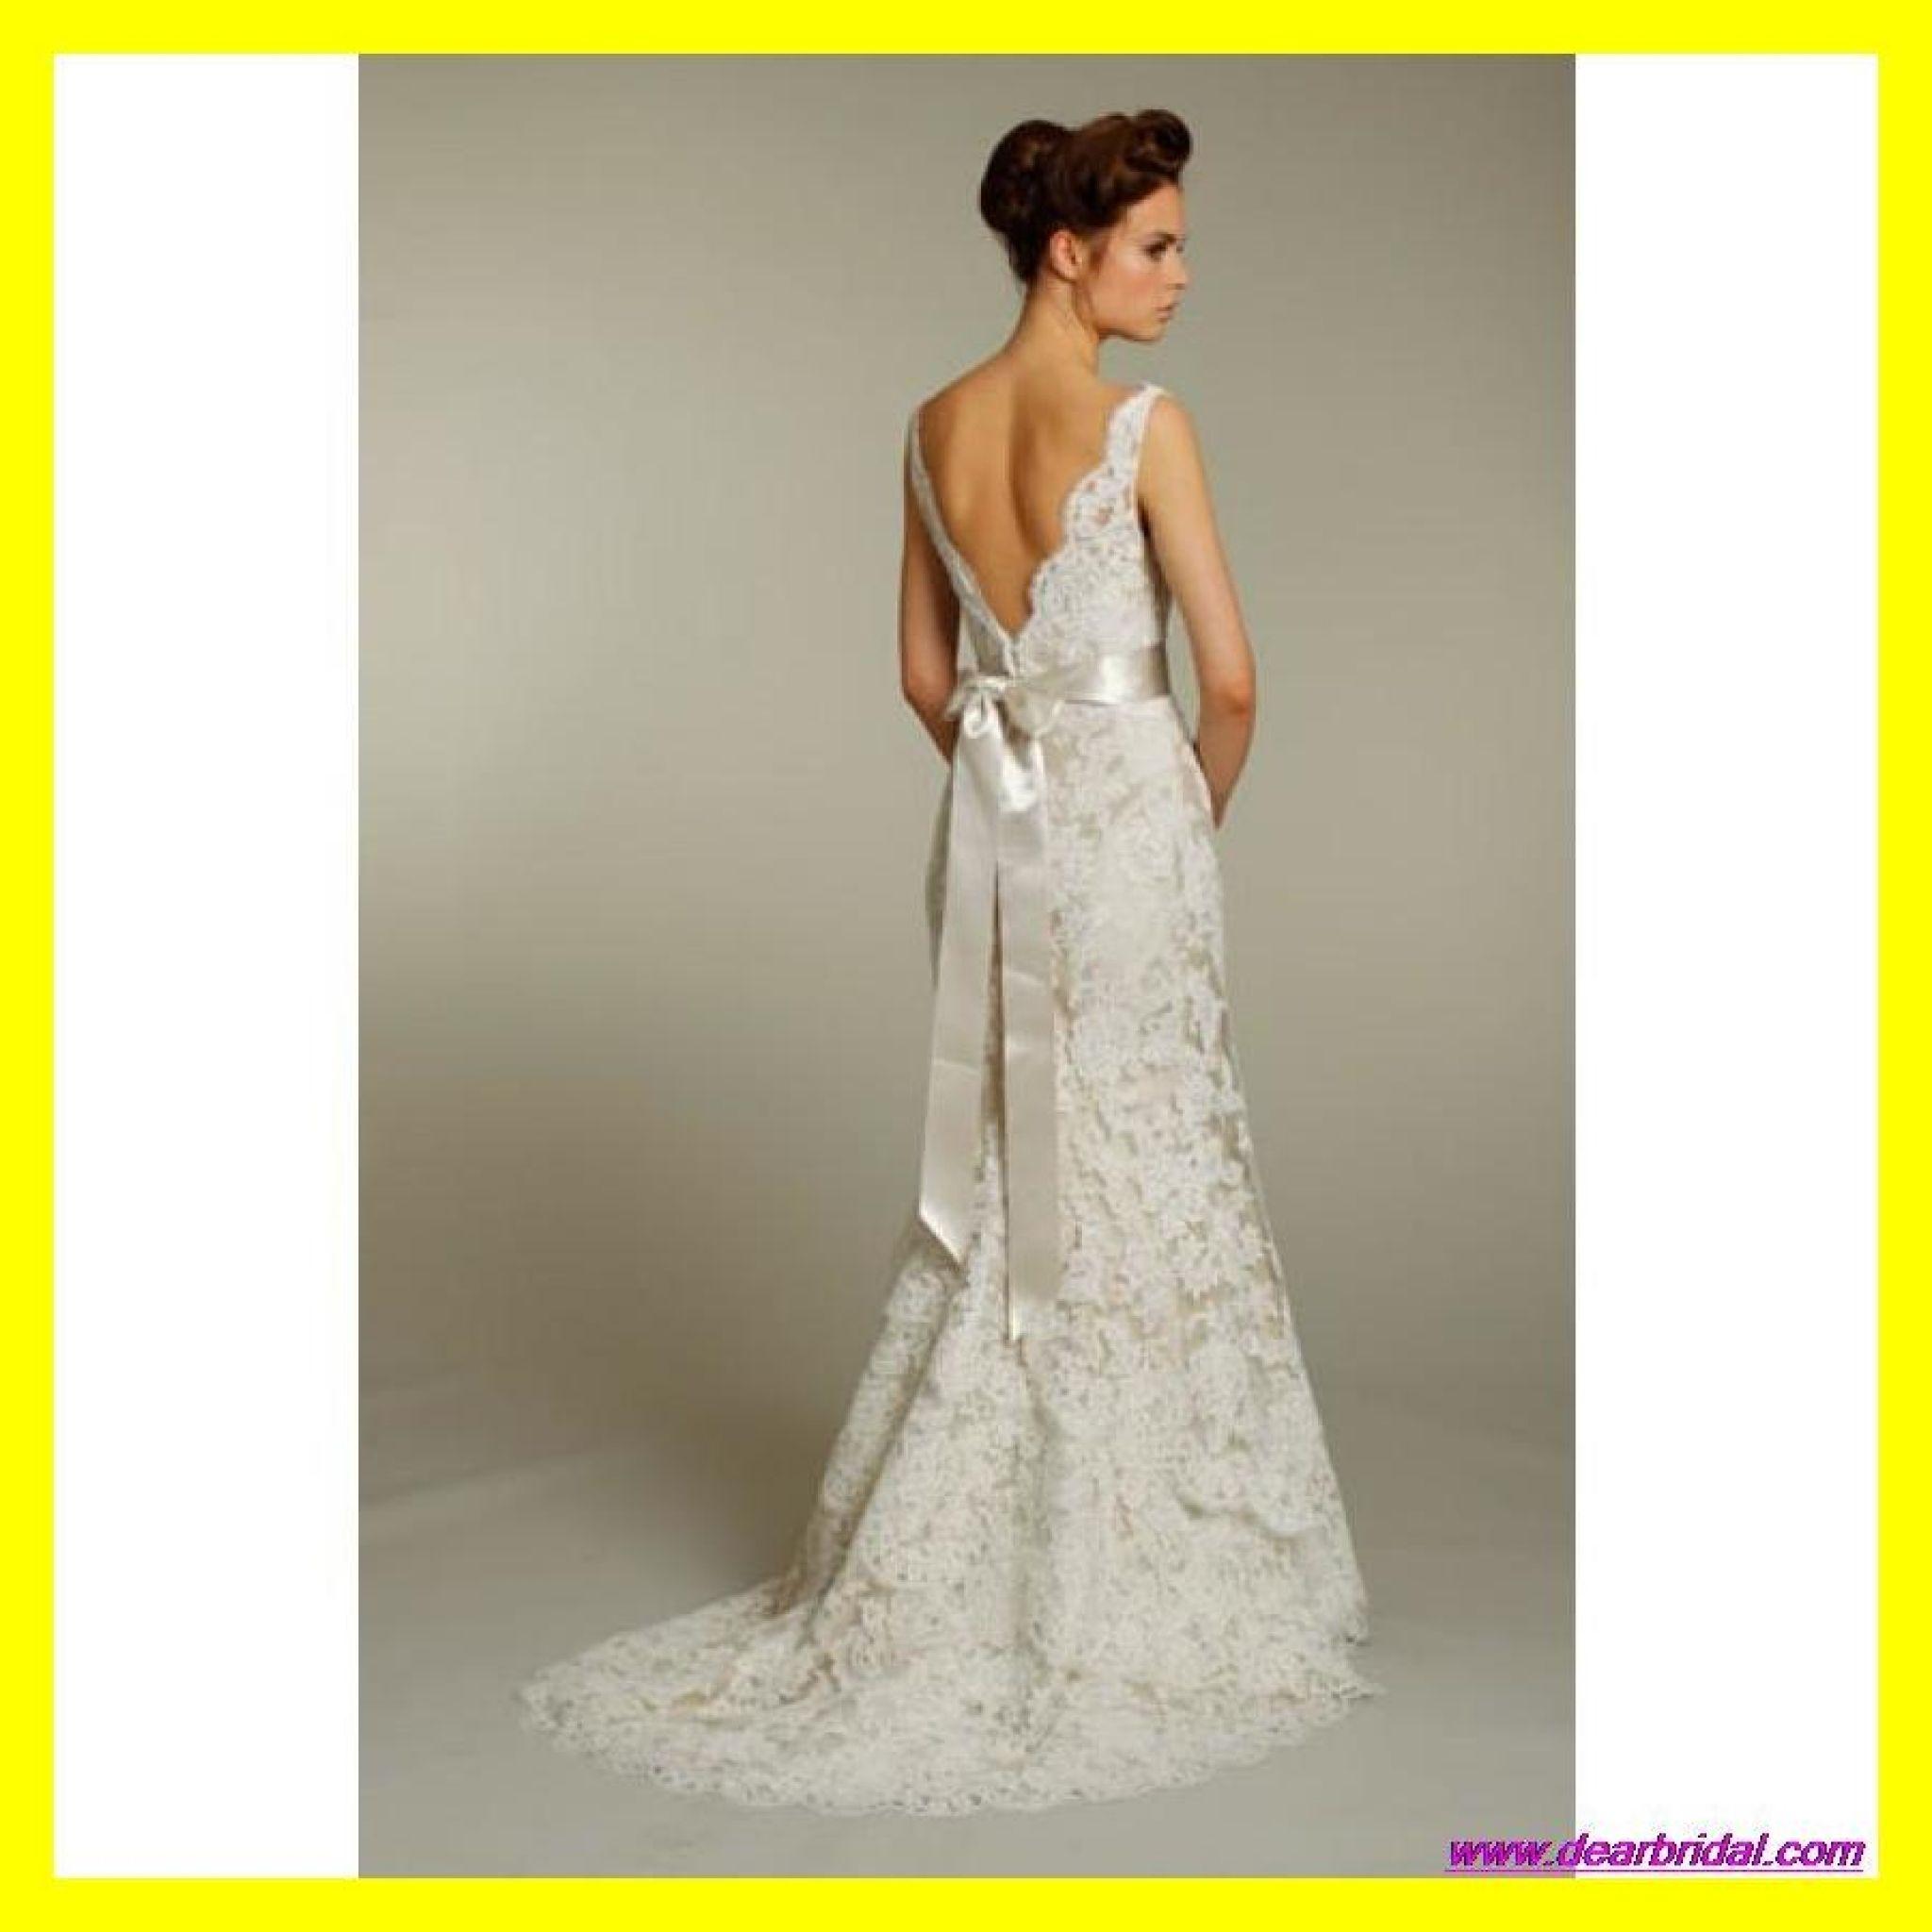 Designer Wedding Dress Hire London